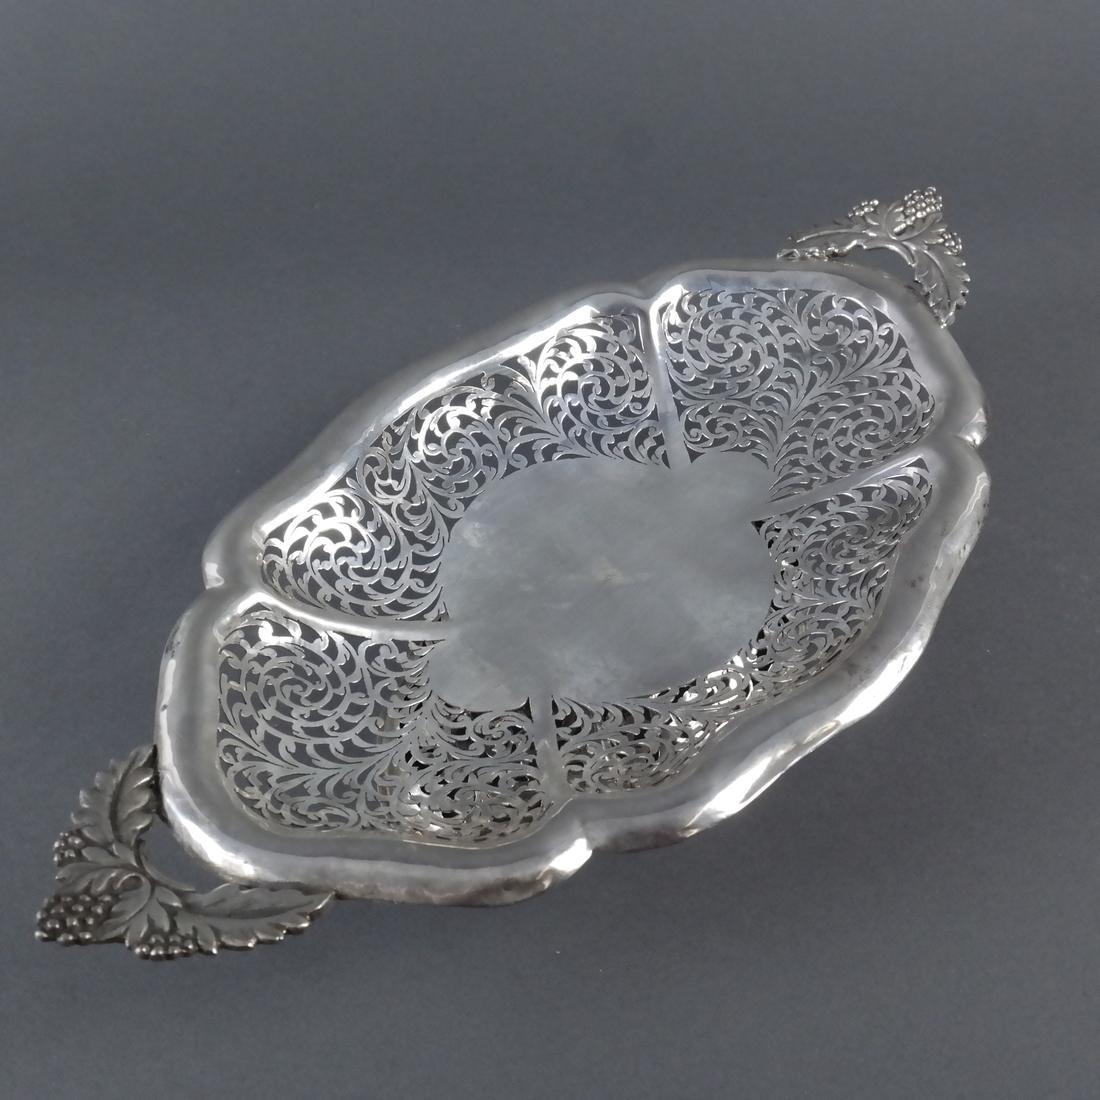 .900 Standard Silver Pierced Compote - 5